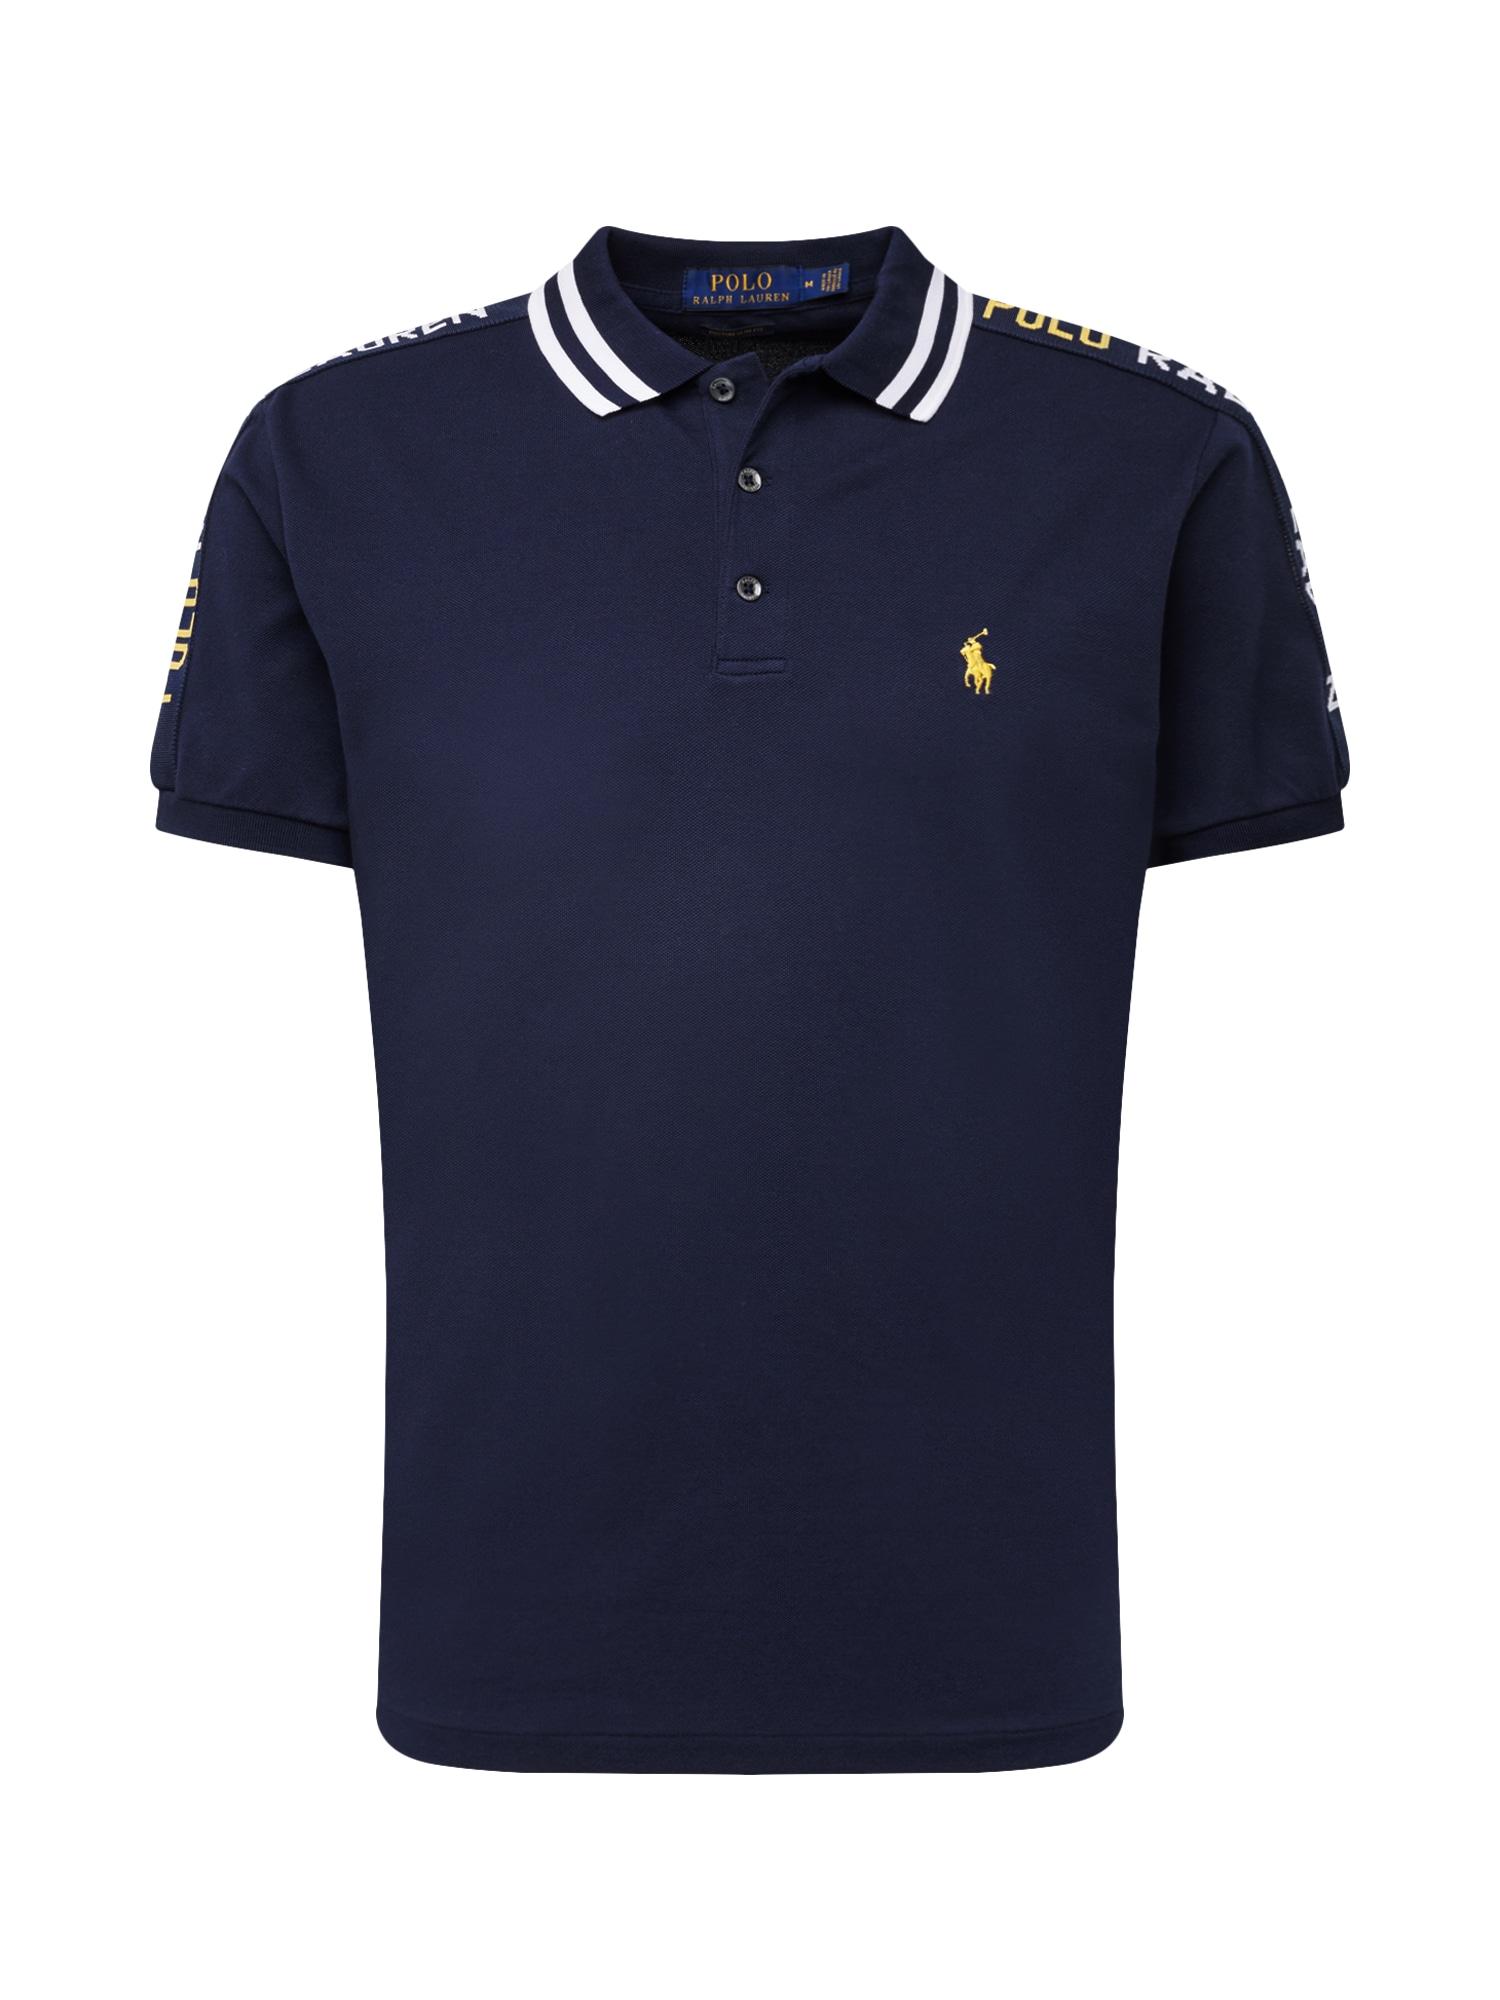 Tričko námořnická modř žlutá bílá POLO RALPH LAUREN